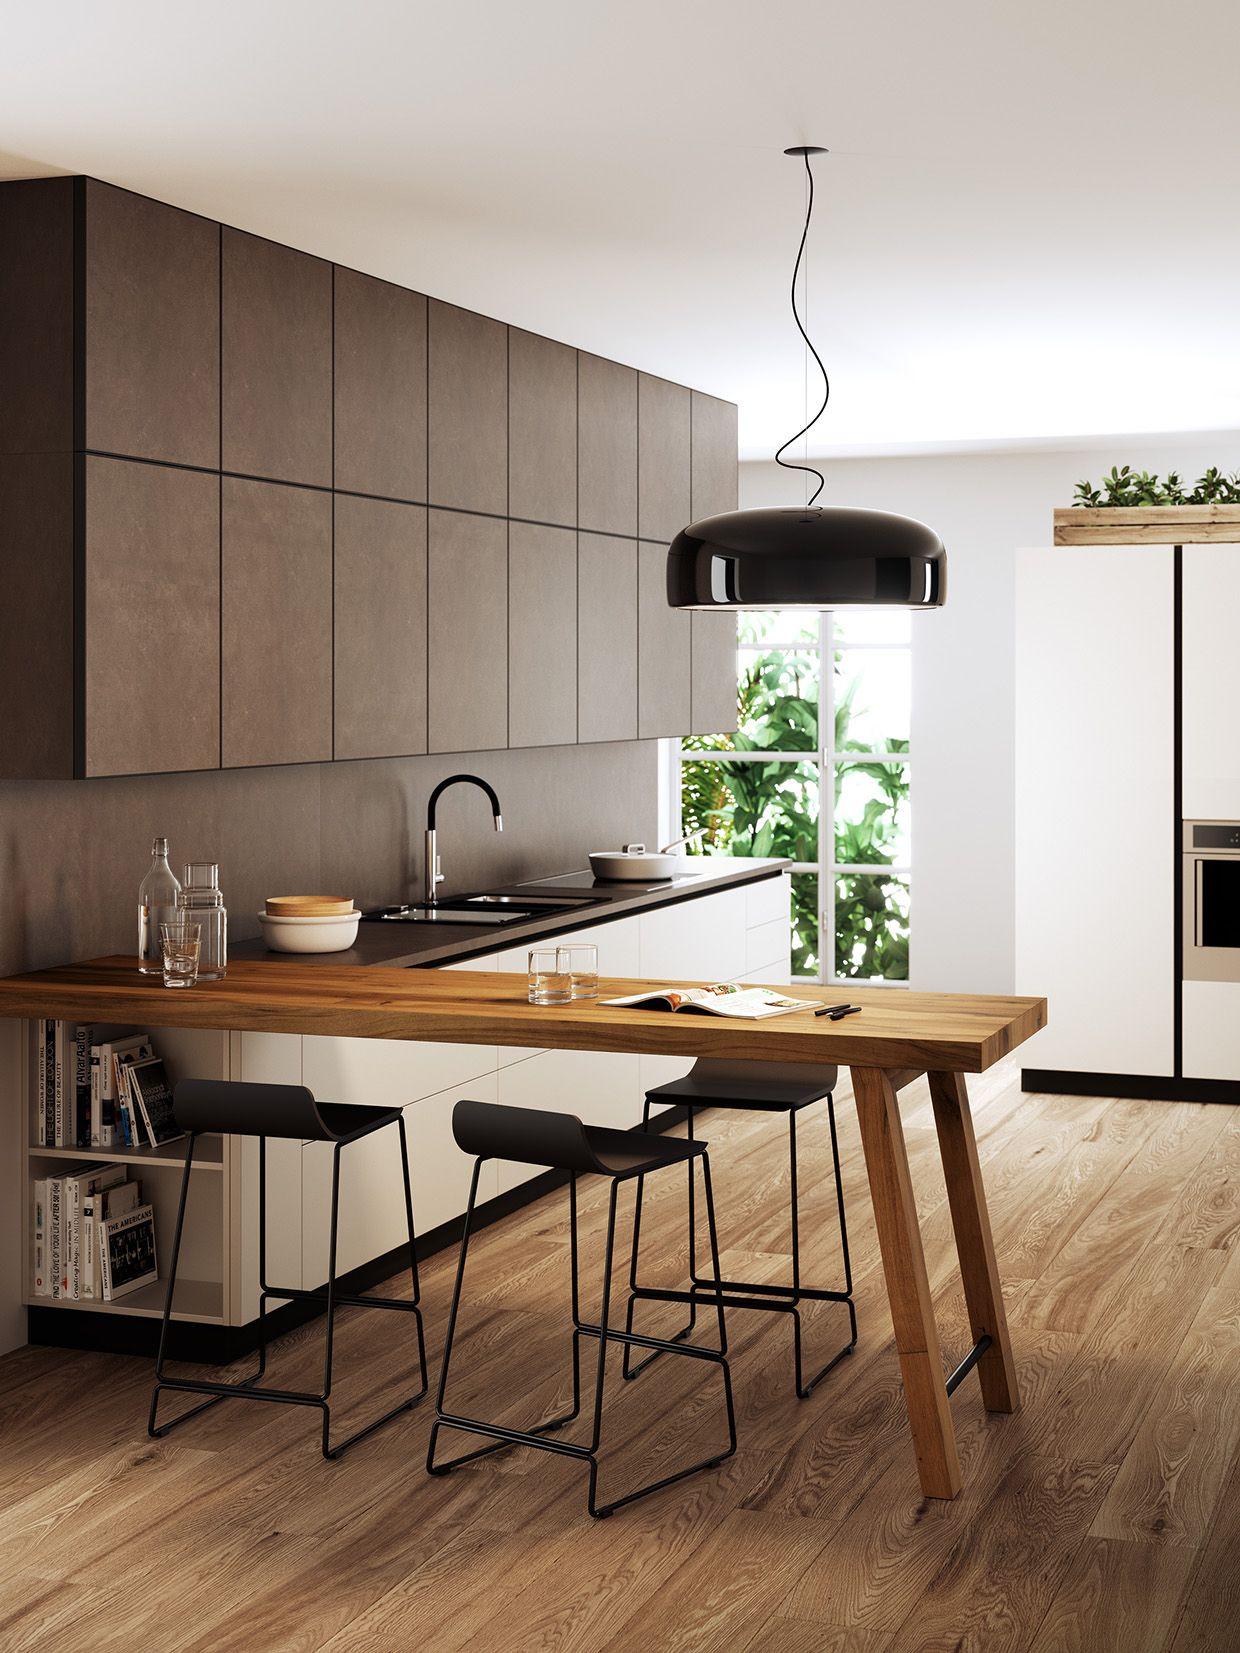 Pin Do A Roko Em Kitchen Design Pinterest Apartamentos